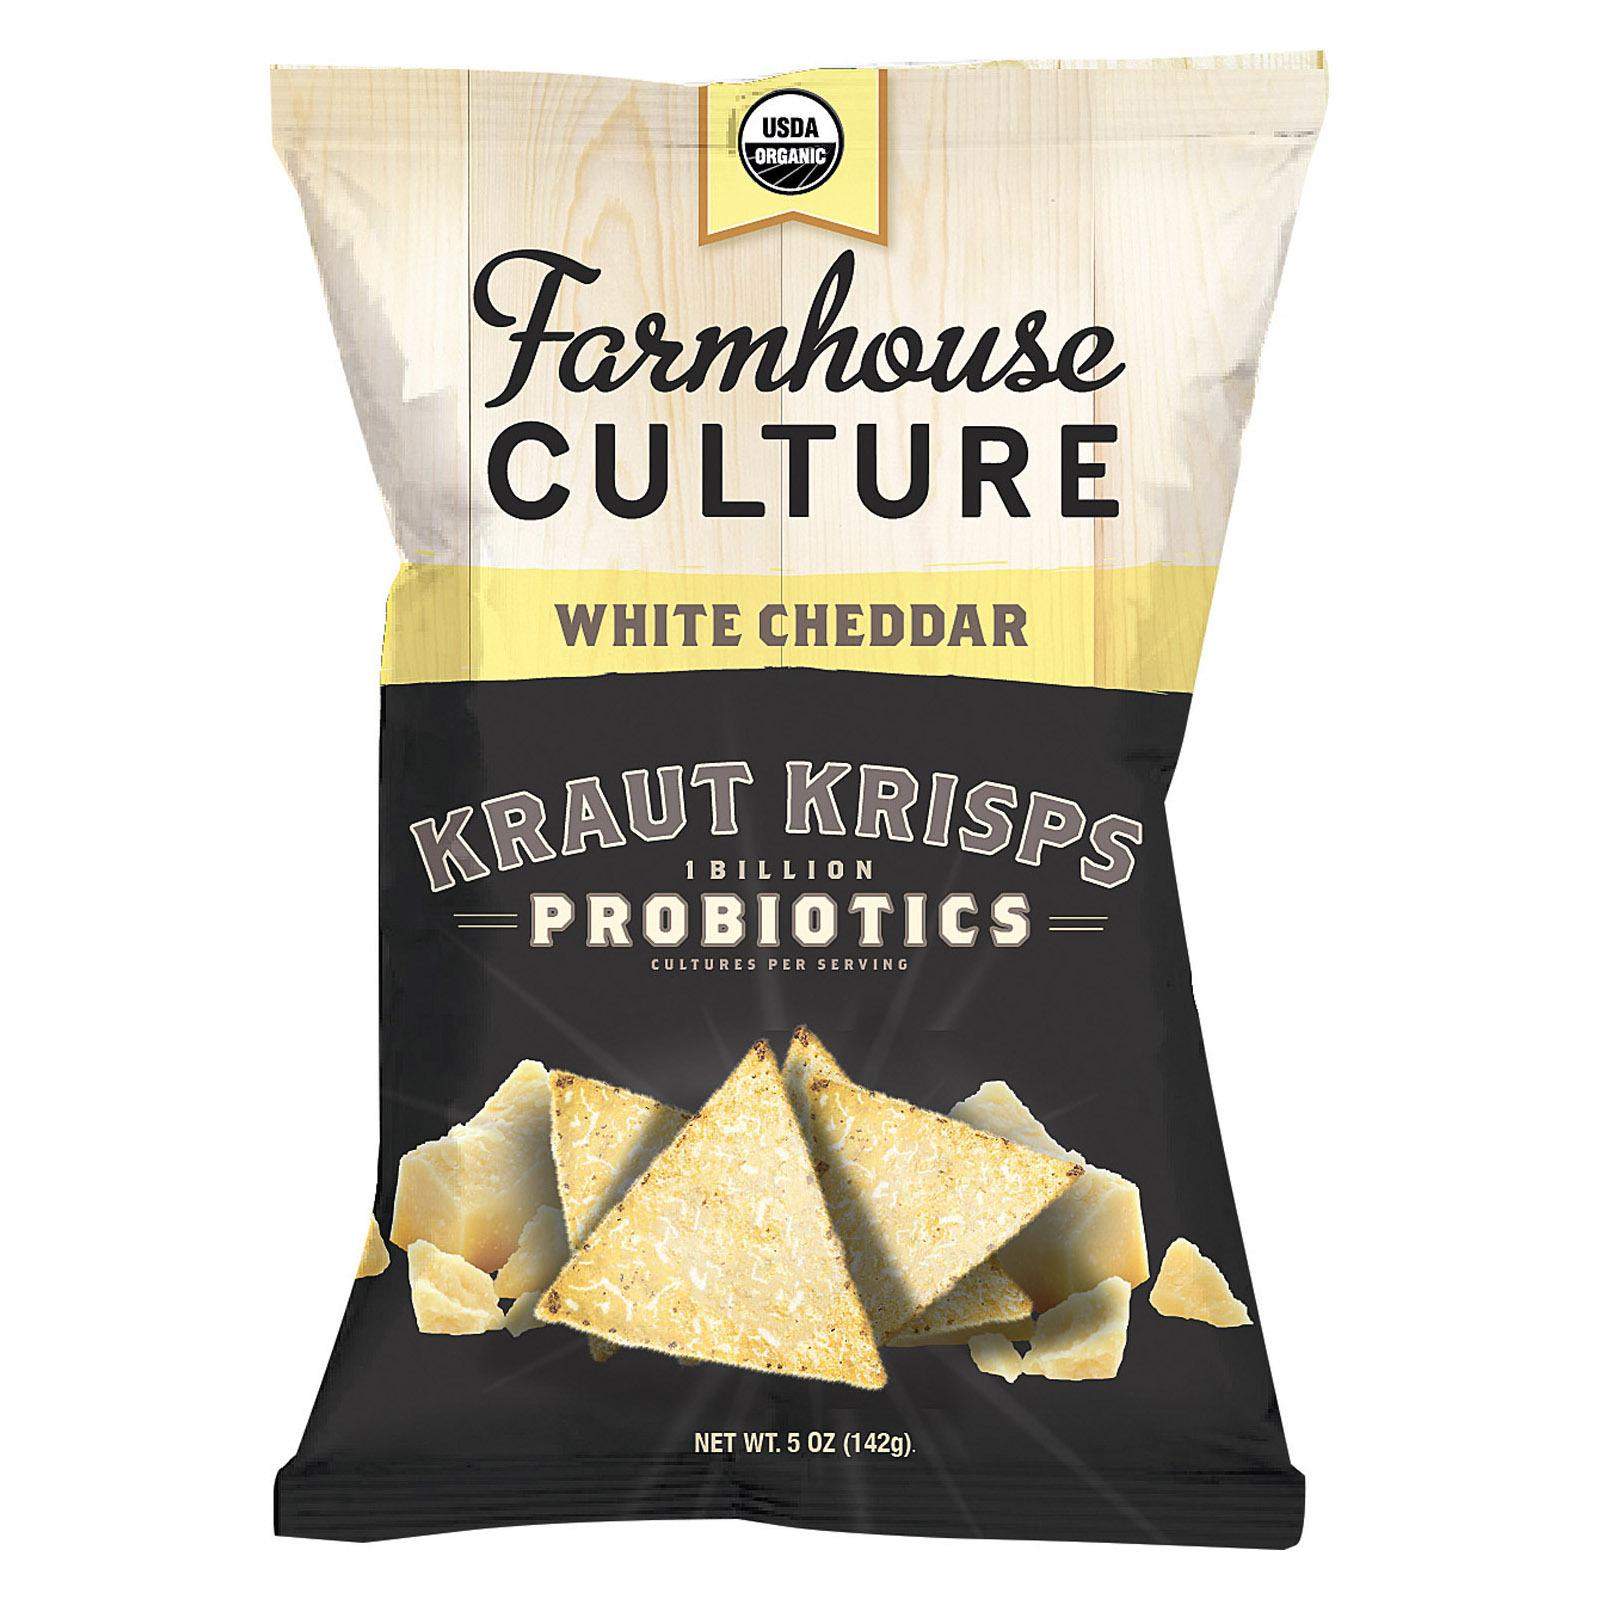 Farmhouse Culture Organic Probiotic Kraut Krisps - White Cheddar - Case of 12 - 5 oz